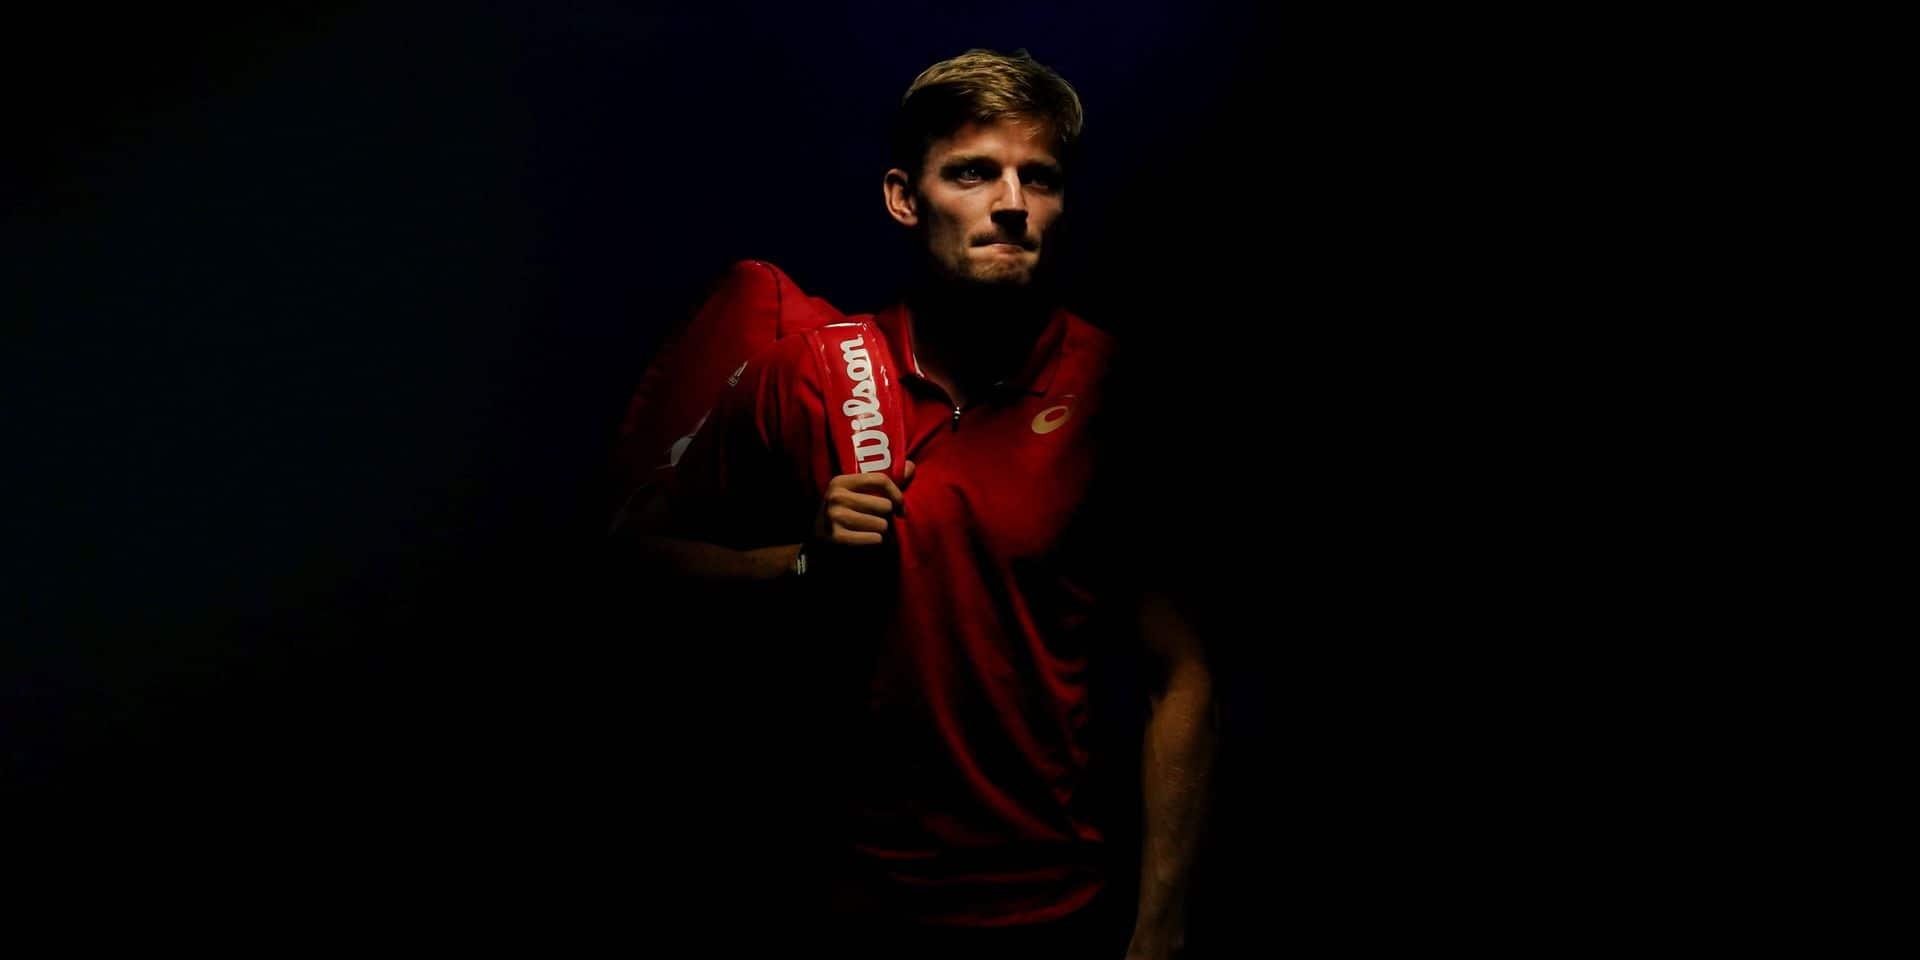 Open 13 Provence ATP 250 - David Goffin vs Egor Gerasimov